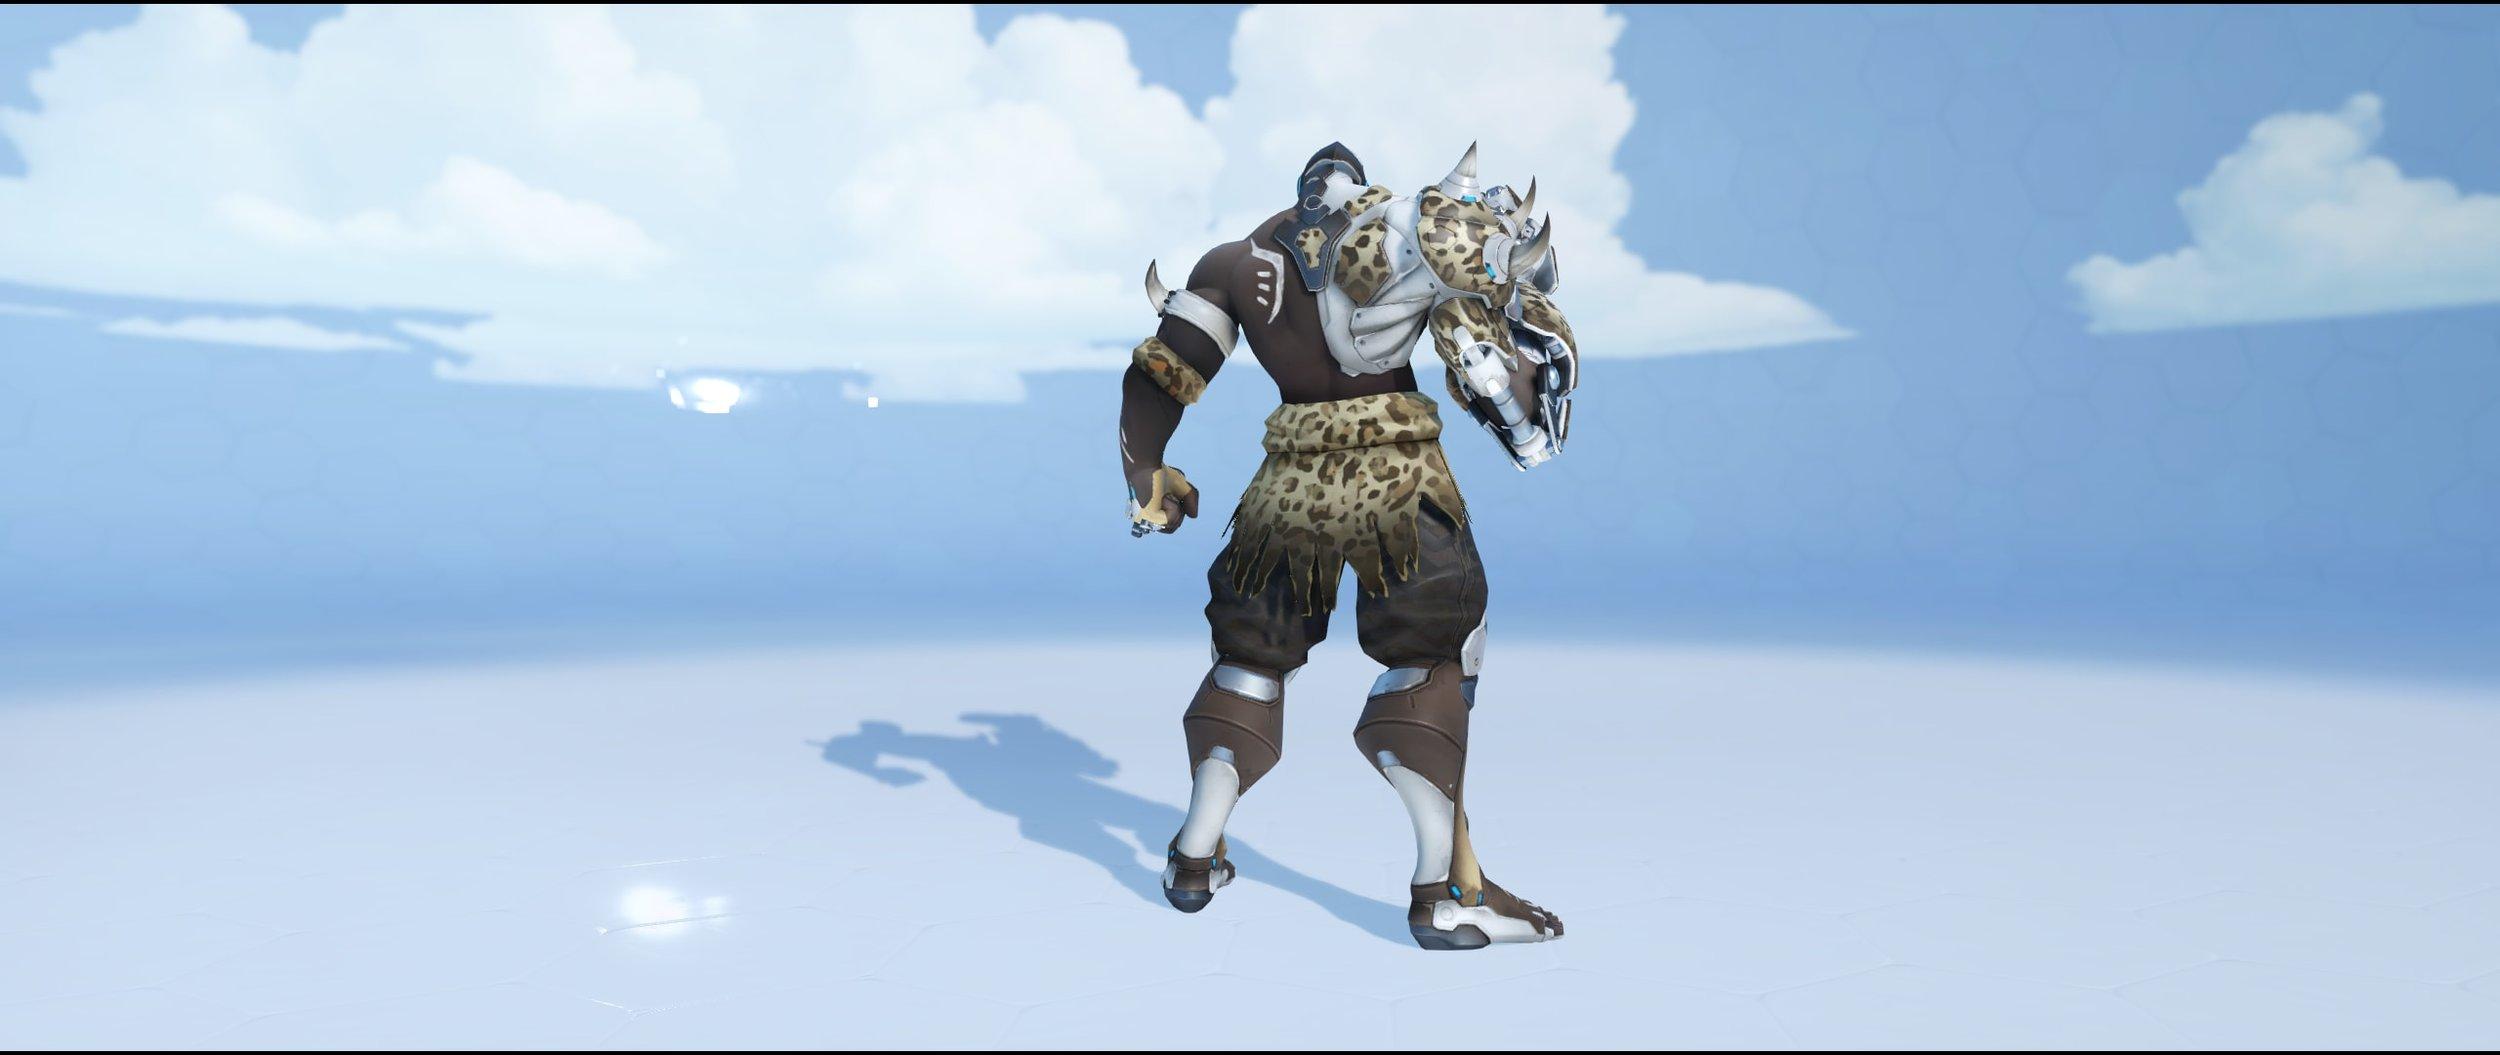 Leopard back epic skin Doomfist Overwatch.jpg